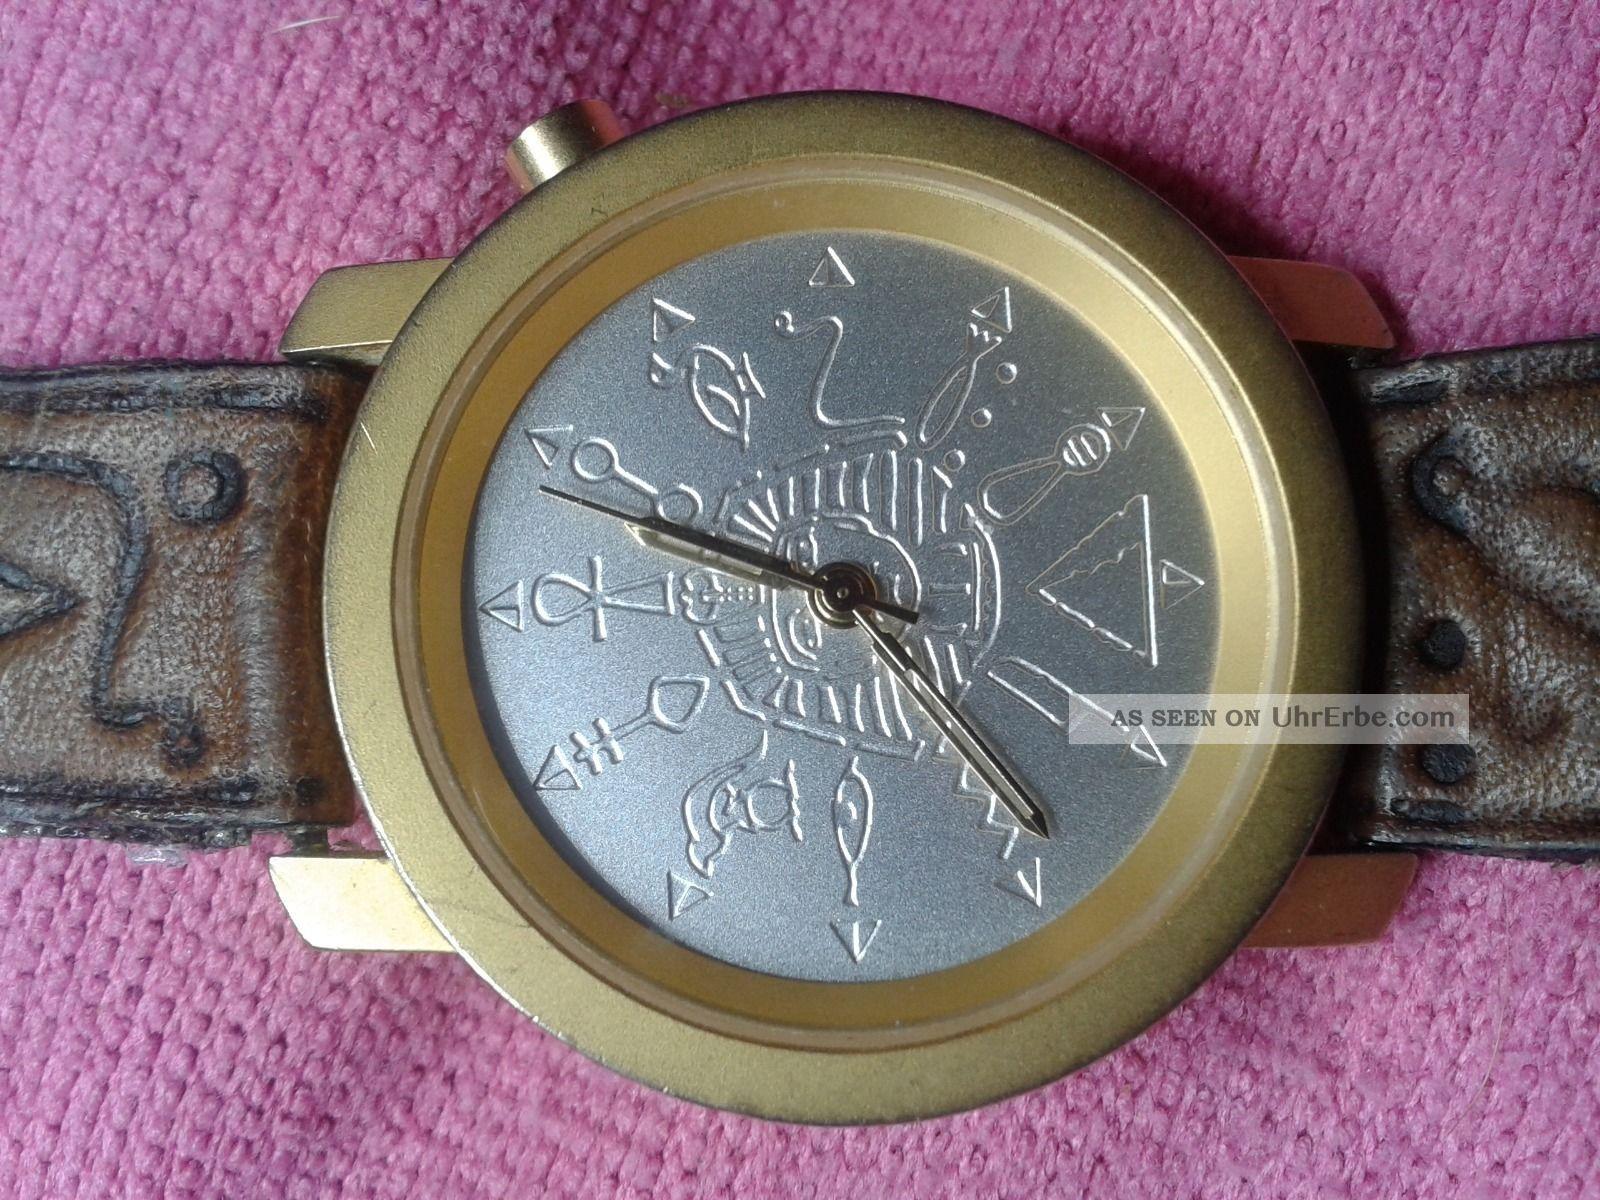 Damenuhr 352901 - 01334043 Quarz Analog Armbanduhren Bild